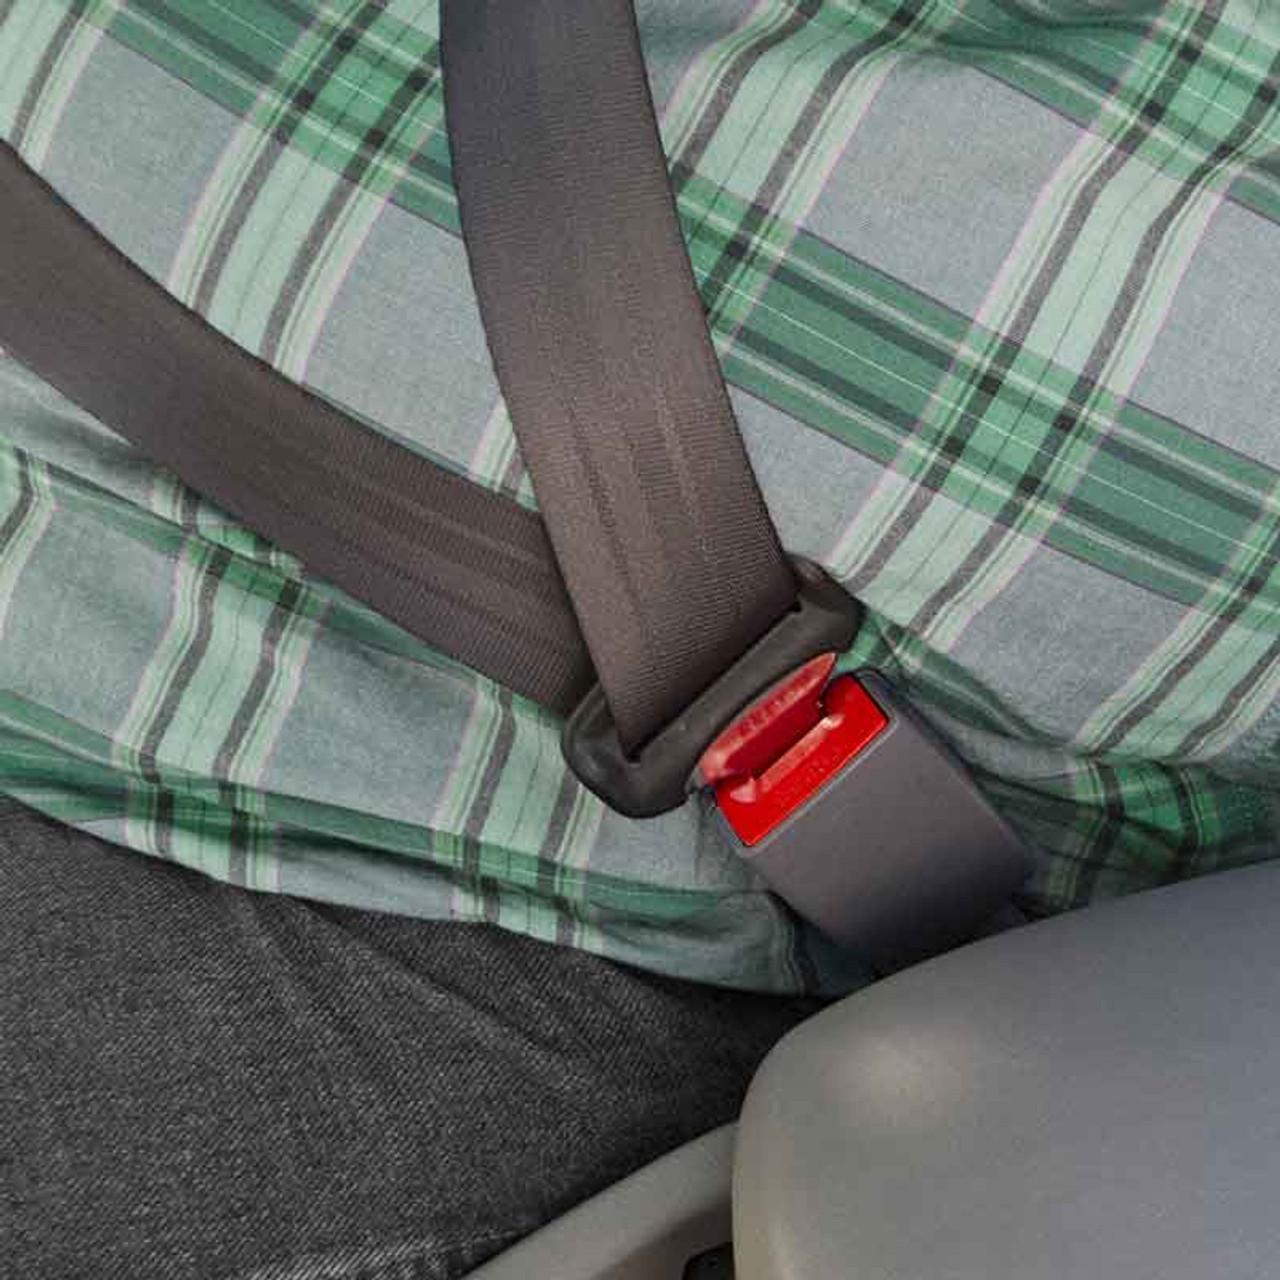 Rigid Seat Belt Extender for 2005 Dodge Durango Front Seats E4 Safe